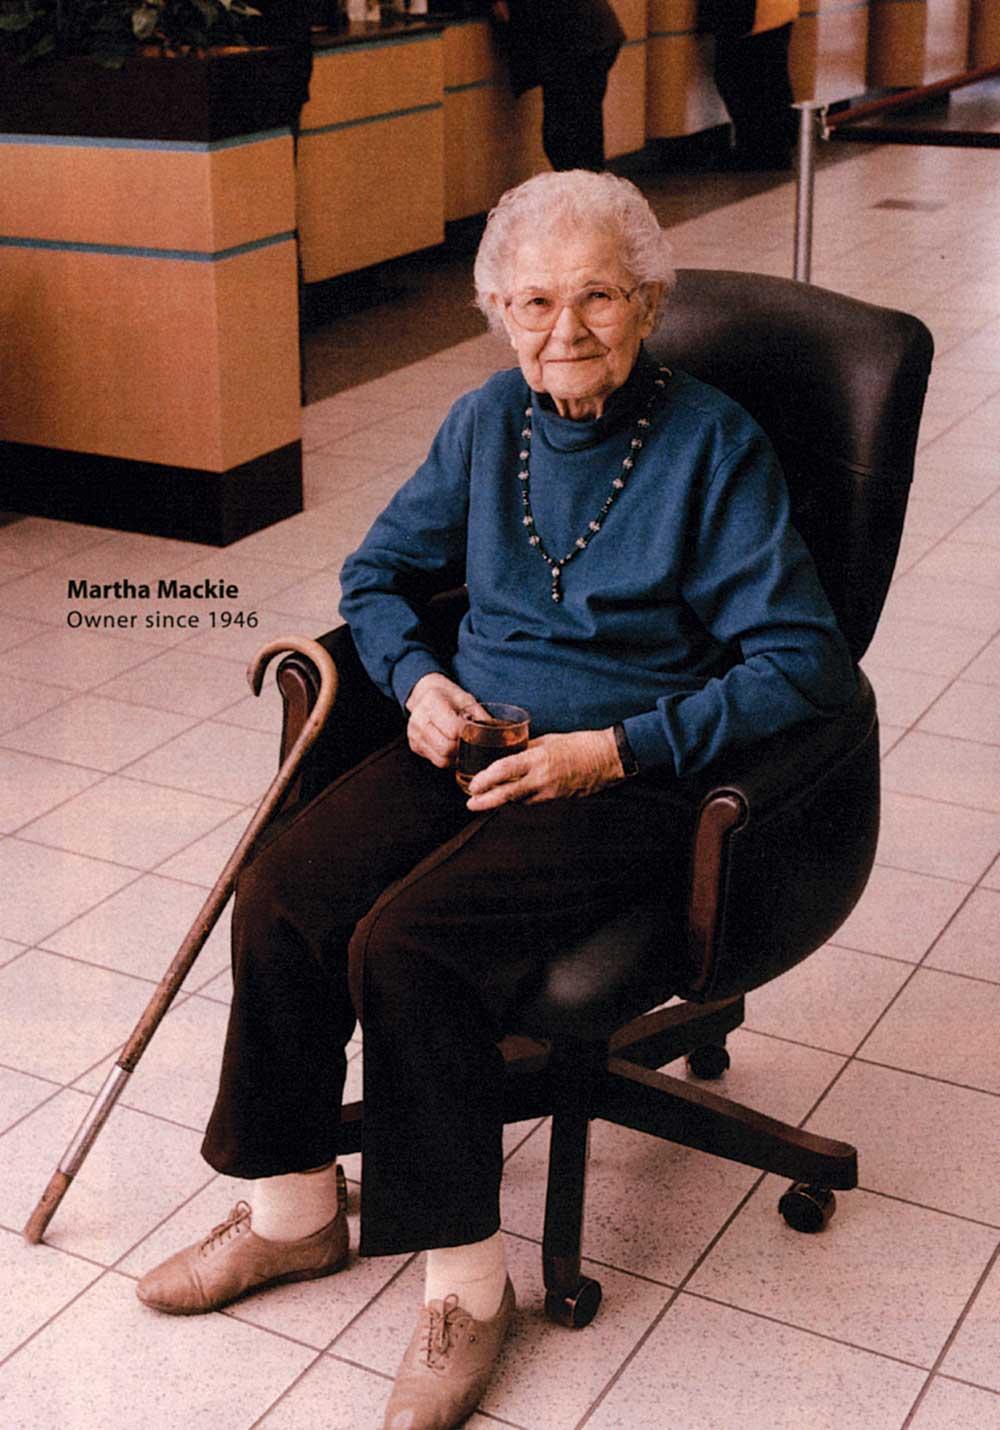 Martha Mackie